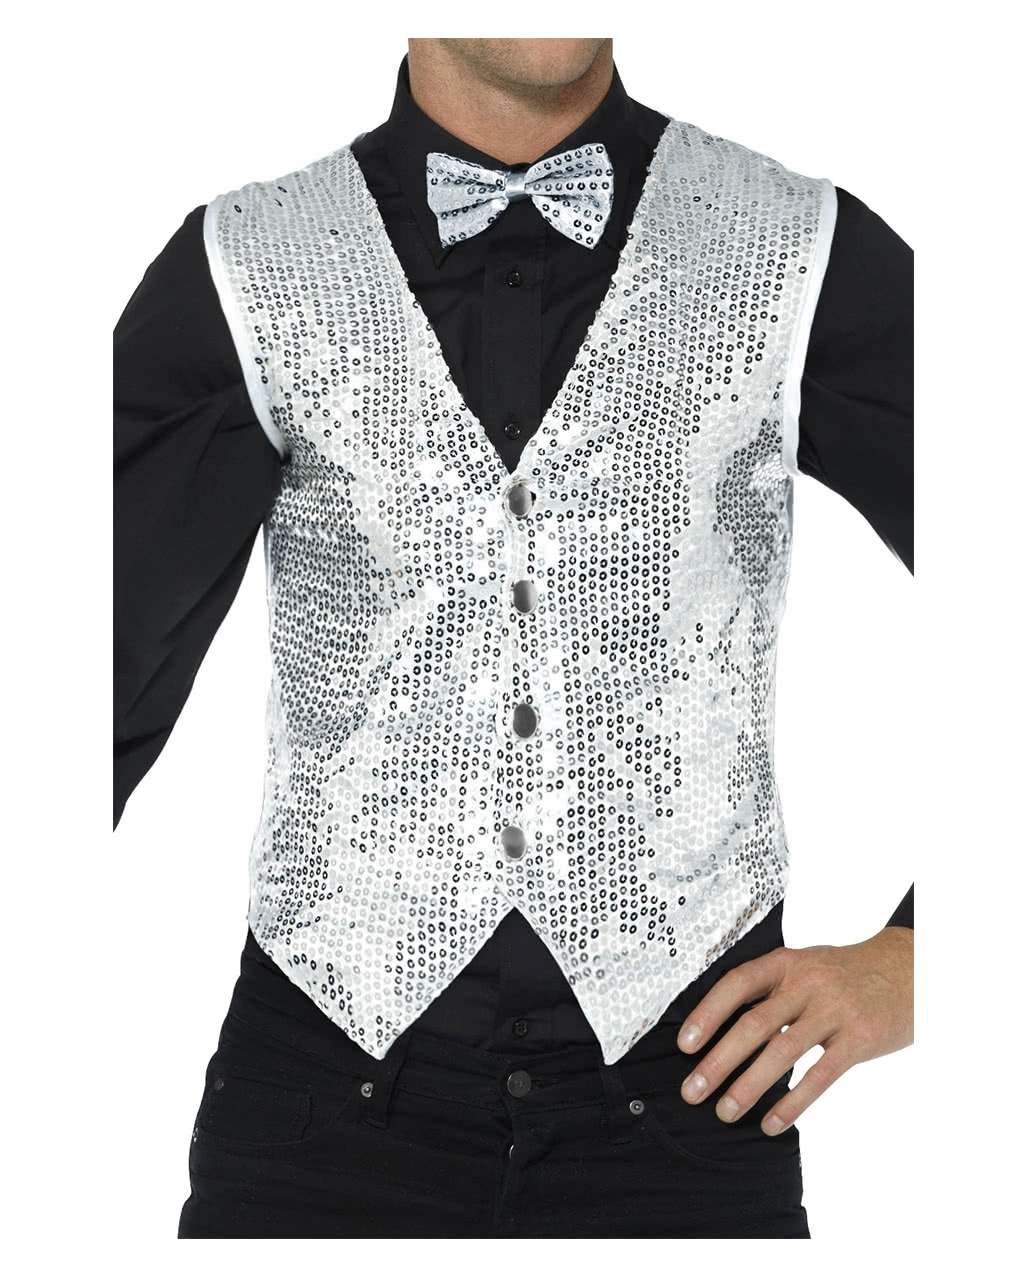 35804613d9a Sequined Vest For Men Silver